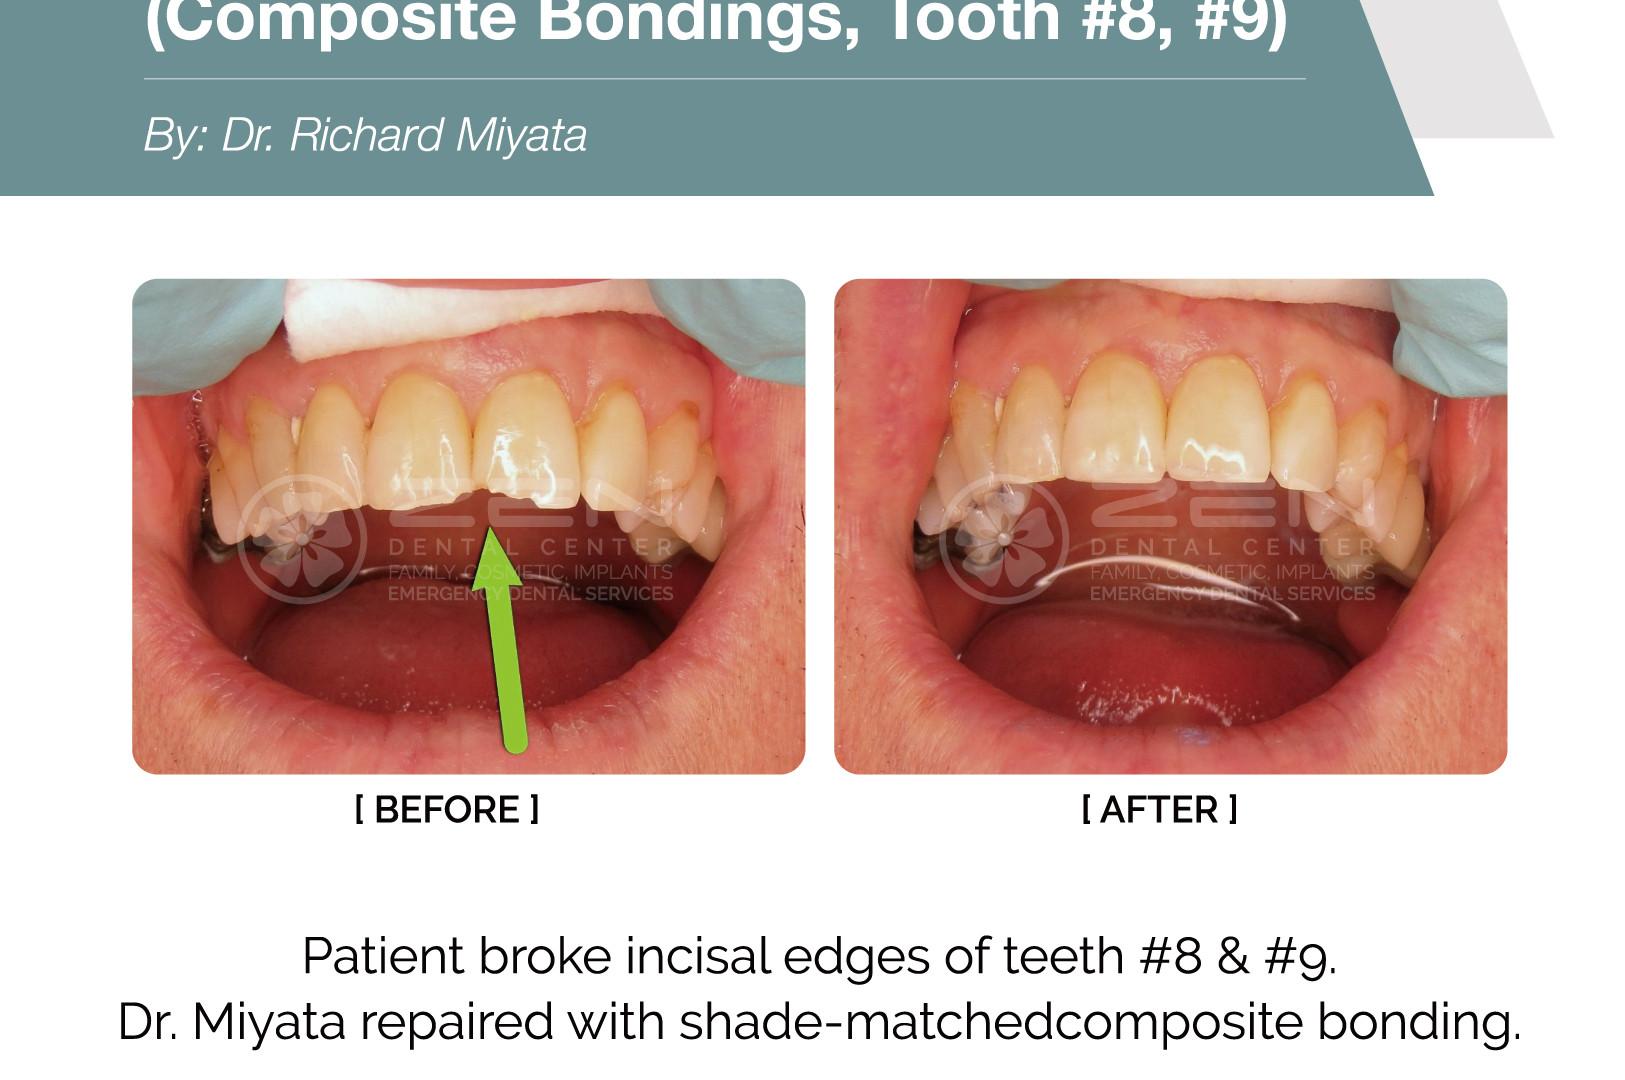 Case Study: Incisal Edge Repair (Compoiste Bondings, Teeth 8,9)